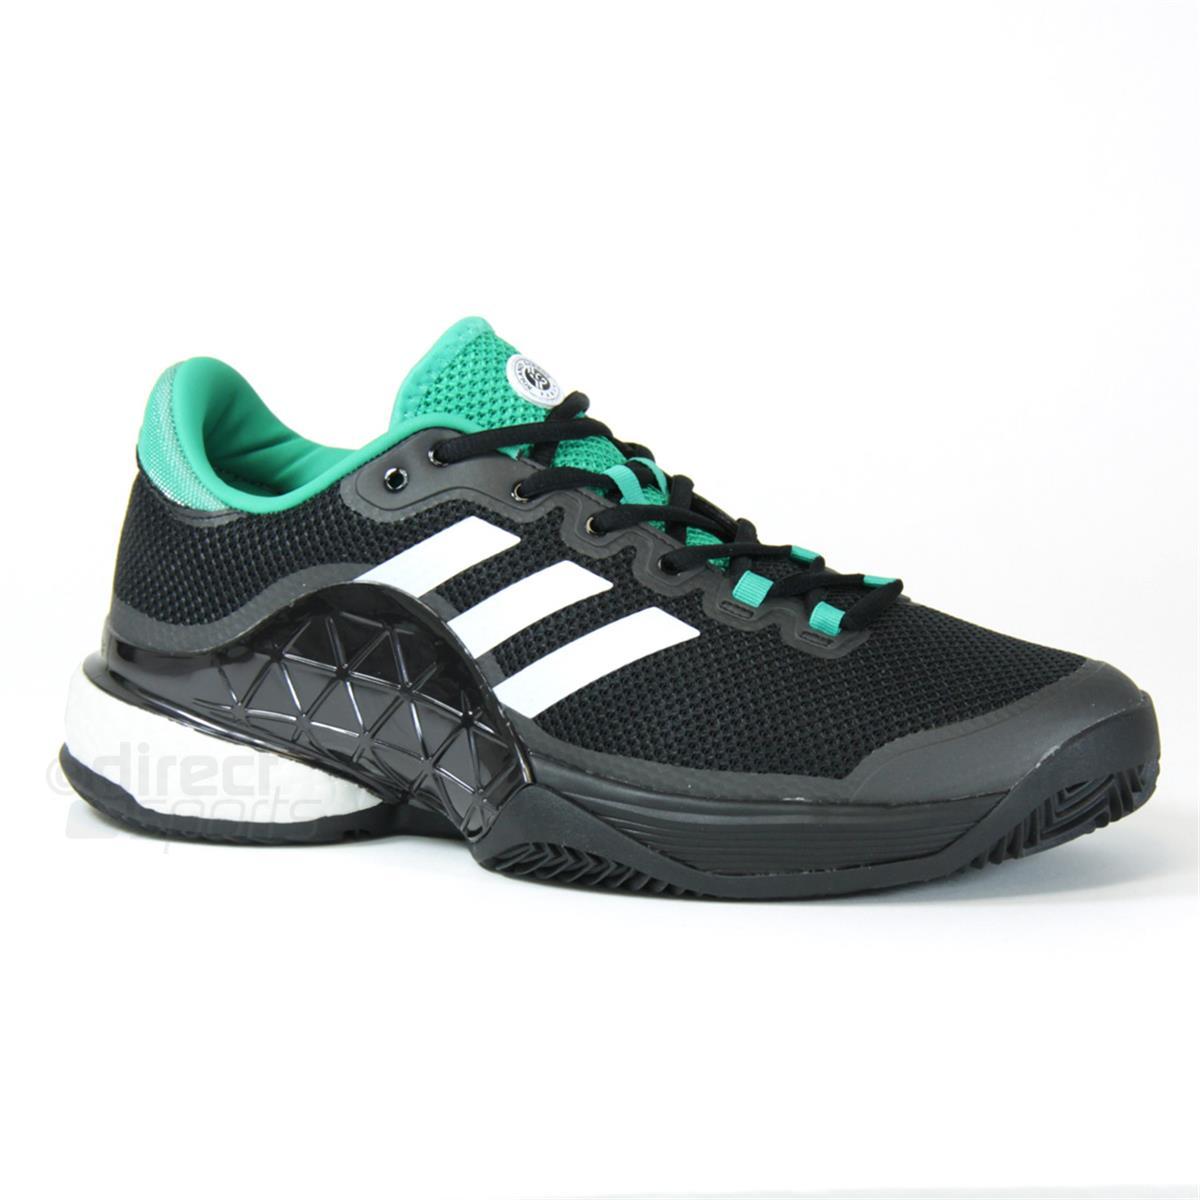 premium selection 06628 93bc7 Adidas Barricade 2017 Boost Clay Mens Tennis Shoes